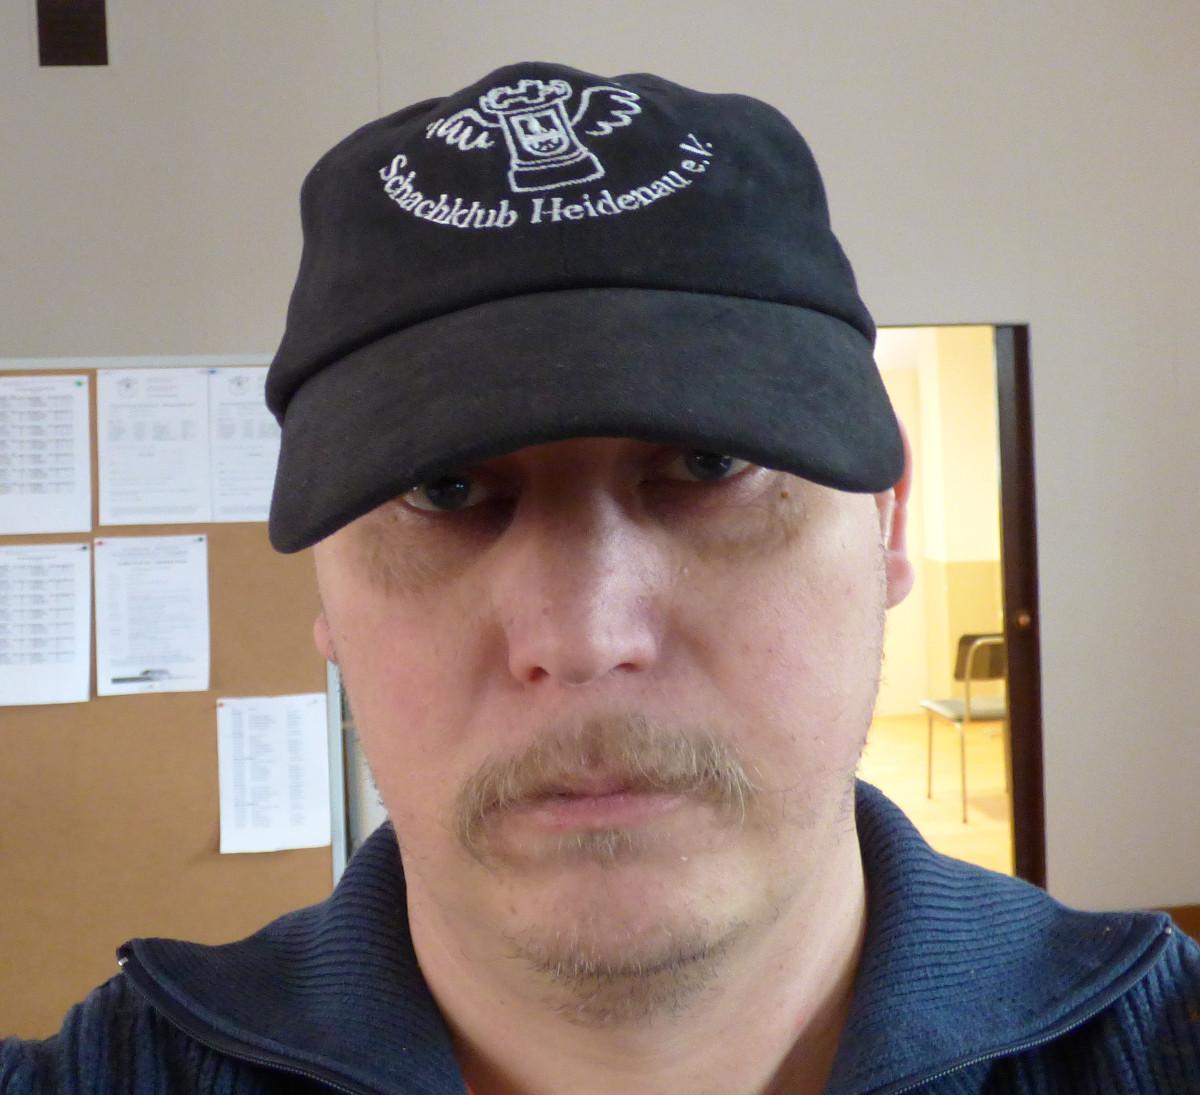 Trainer Heidenau